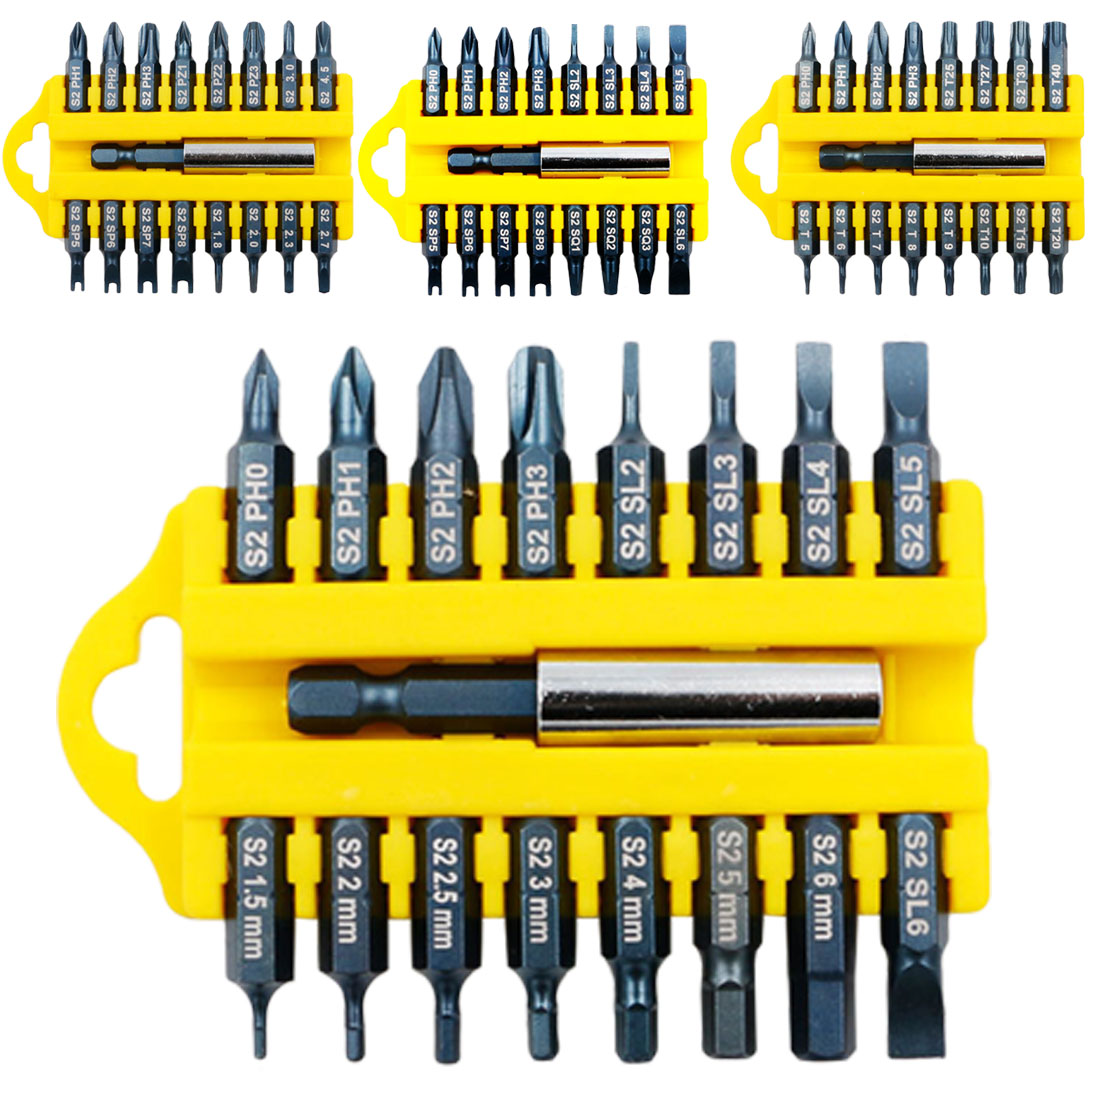 17pcs /set Steel Torx Hex Star Bit Set Magnetic Holder Screwdriver Bits Security Tamper Proof For Cordless Screwdrivers & Drills